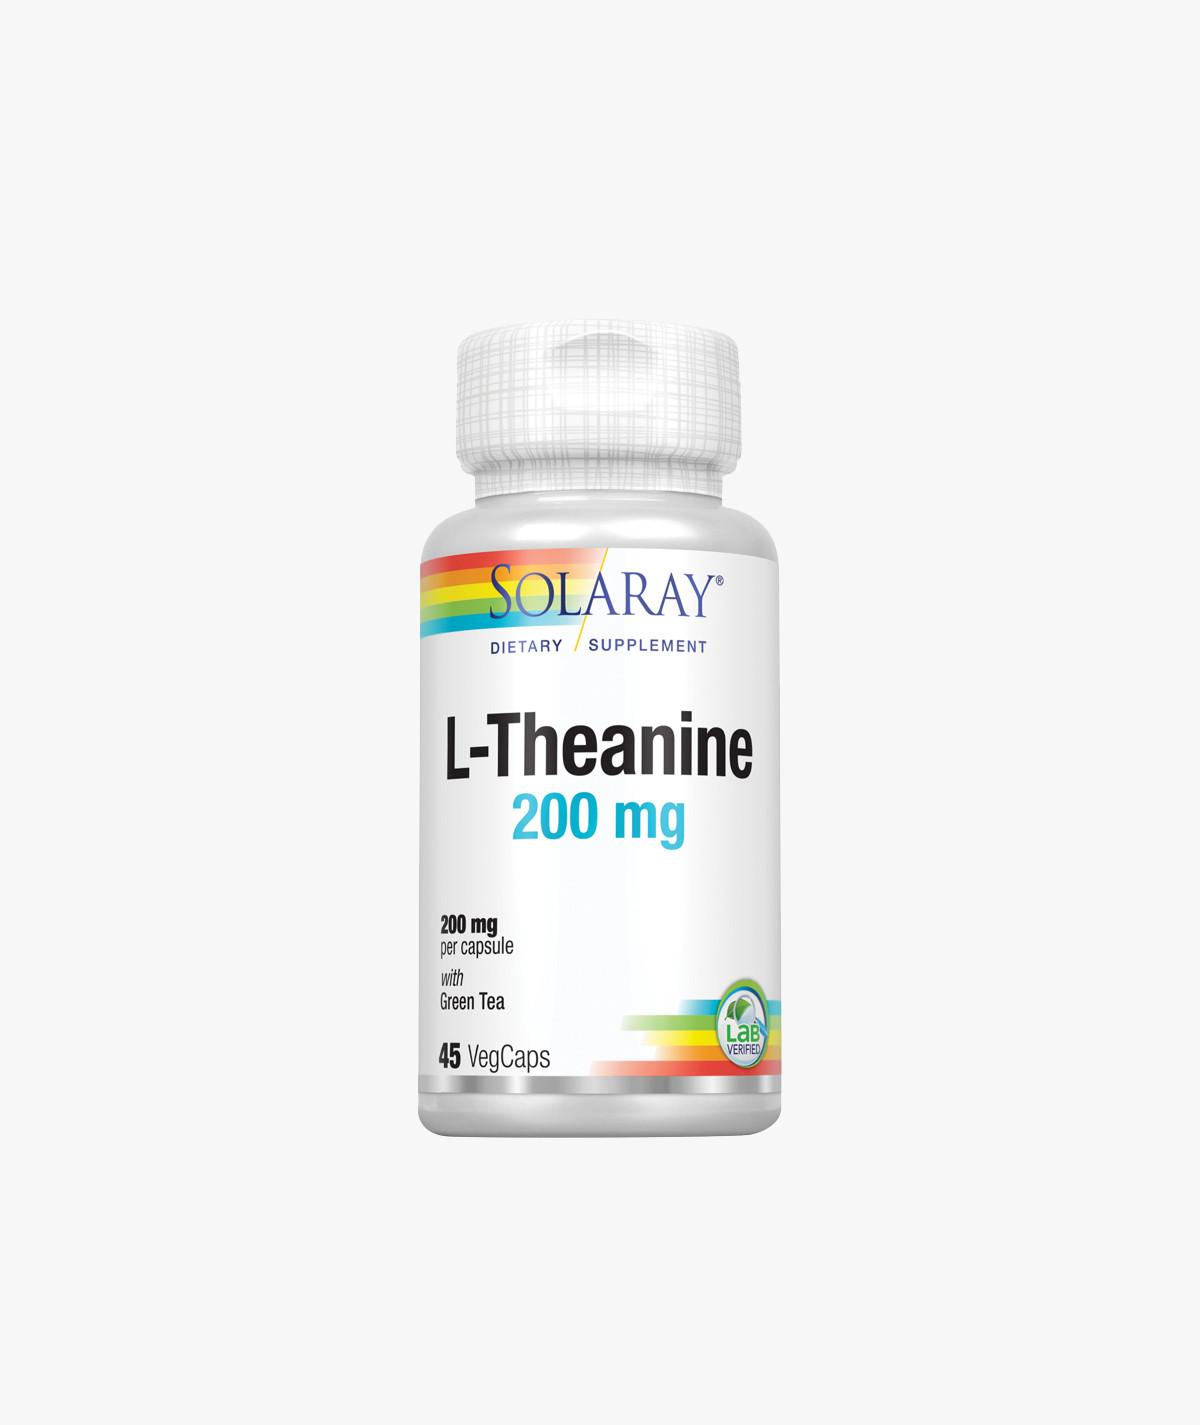 Solaray L-Theanine 200mg